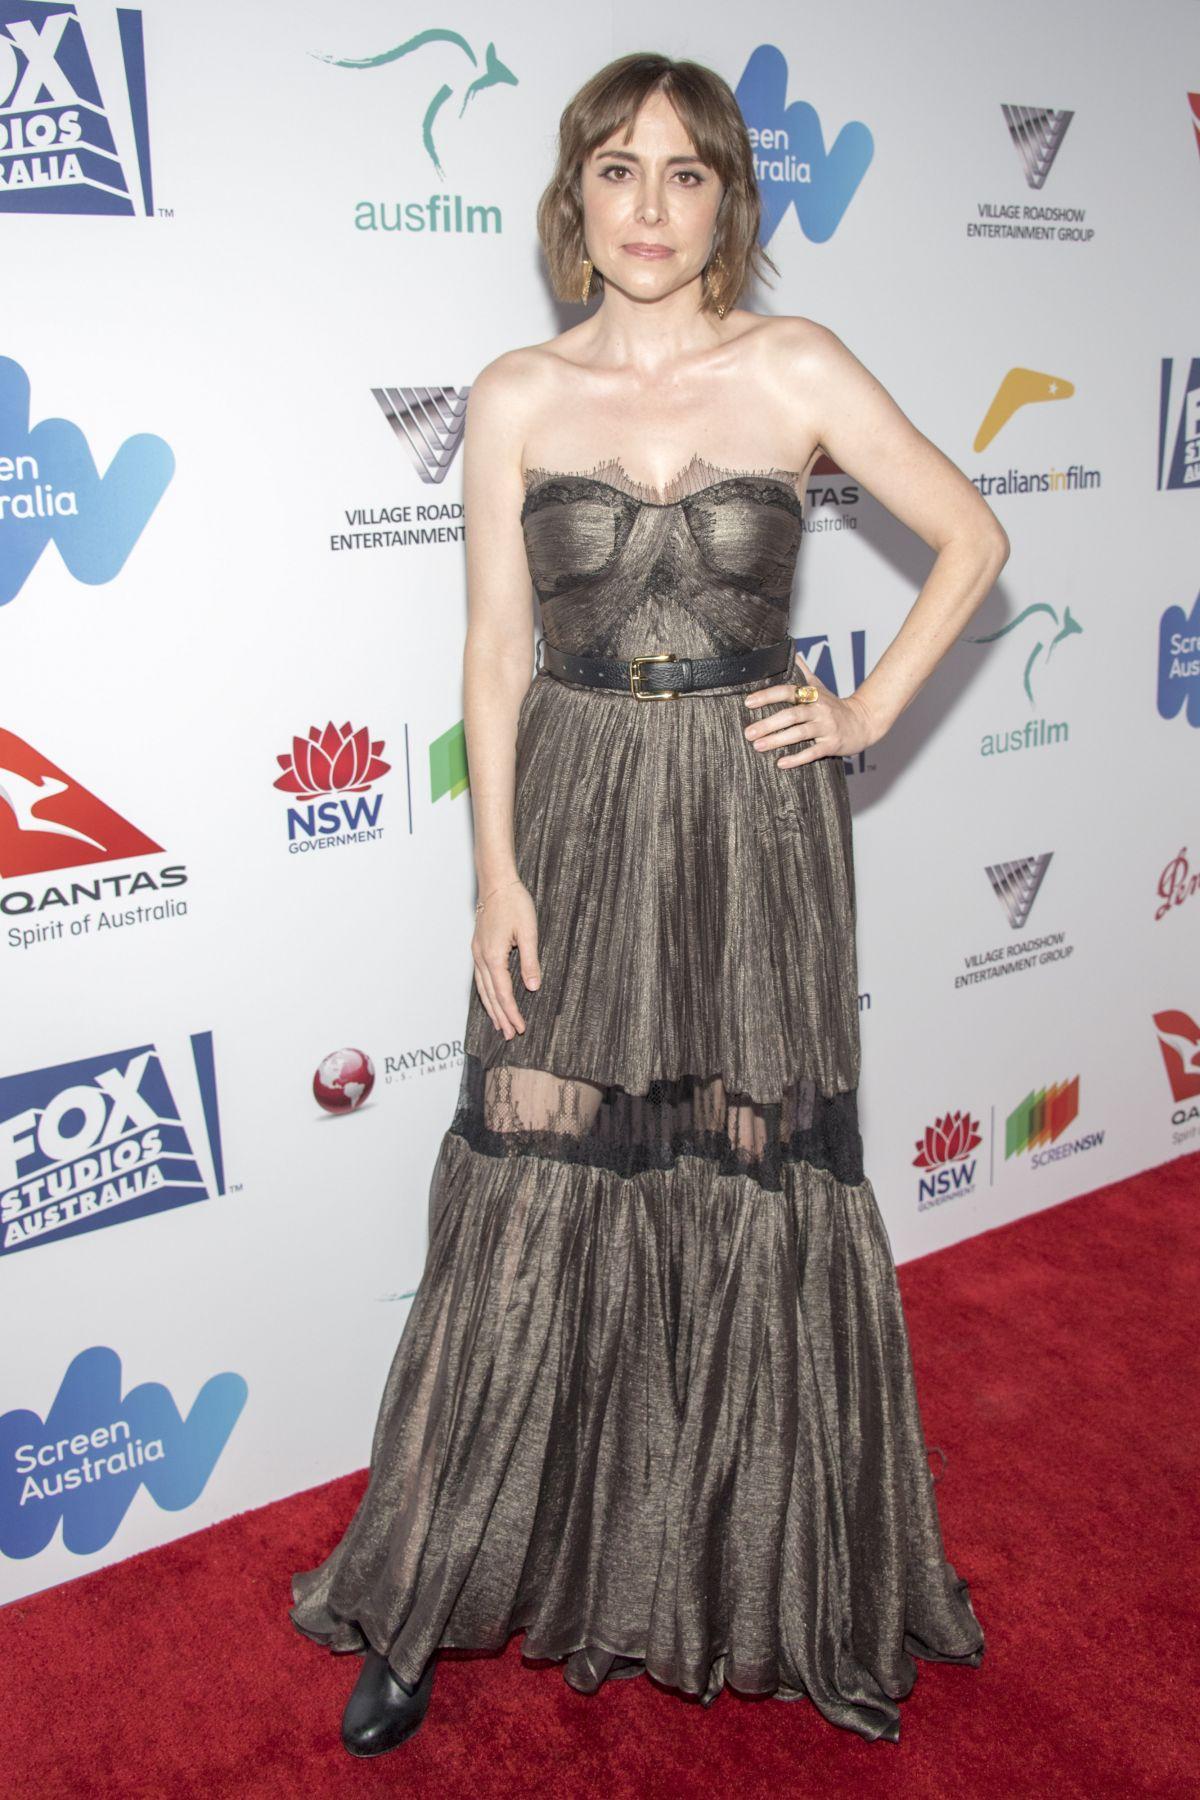 Lea michele instyle magazines 2019 day of indulgence in la,Rose mcgowan leaked Porn pic Cassie Amato,Penelope Cruz Fappening